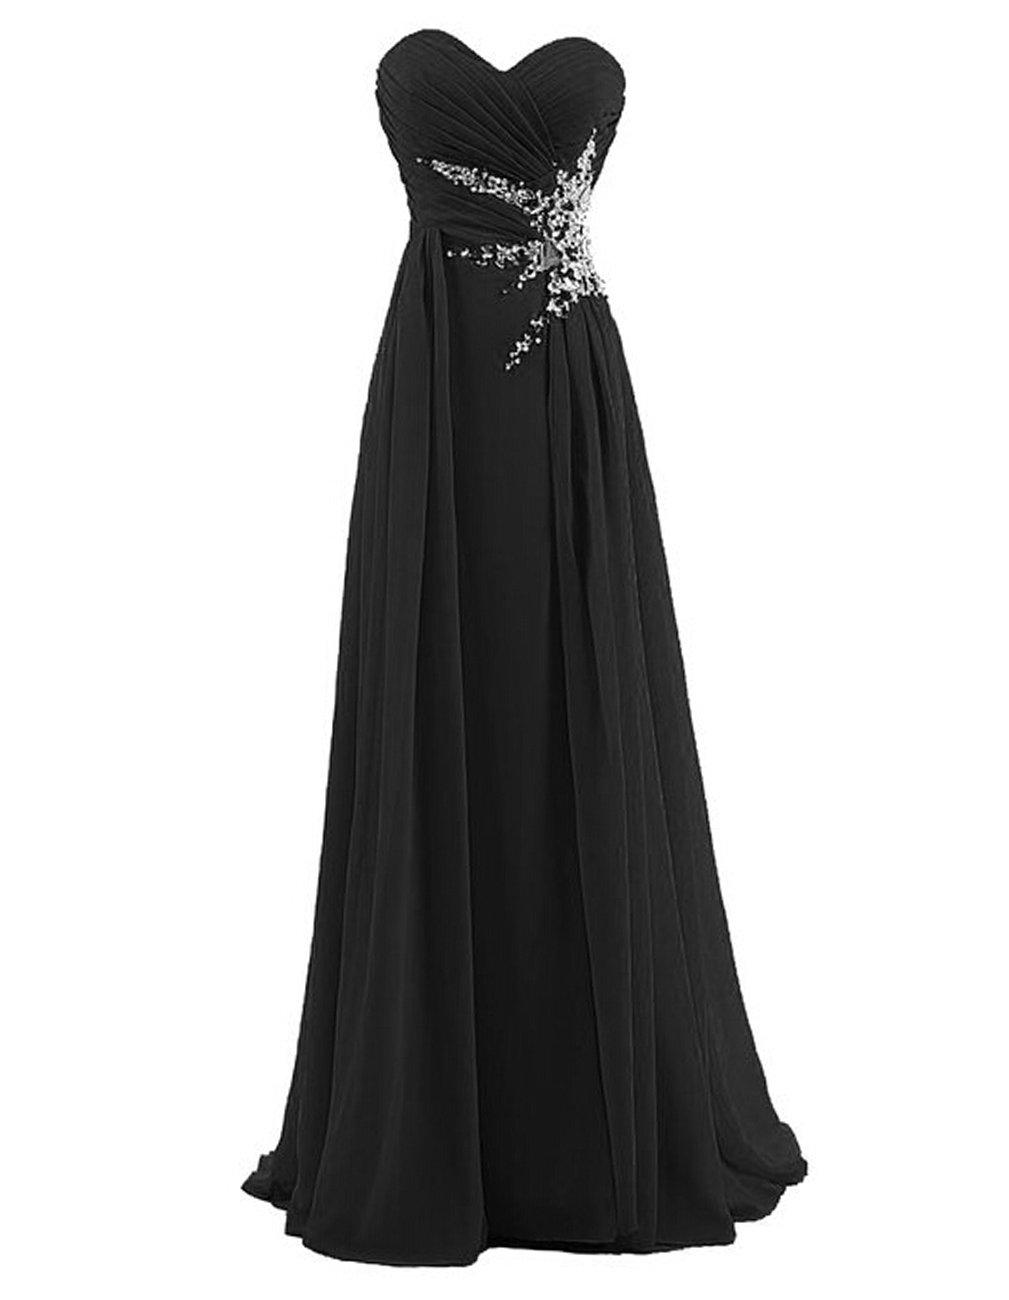 Dresstells Sweetheart Beading Floor-length Chiffon Prom Dress Evening Gown Black Size 18W